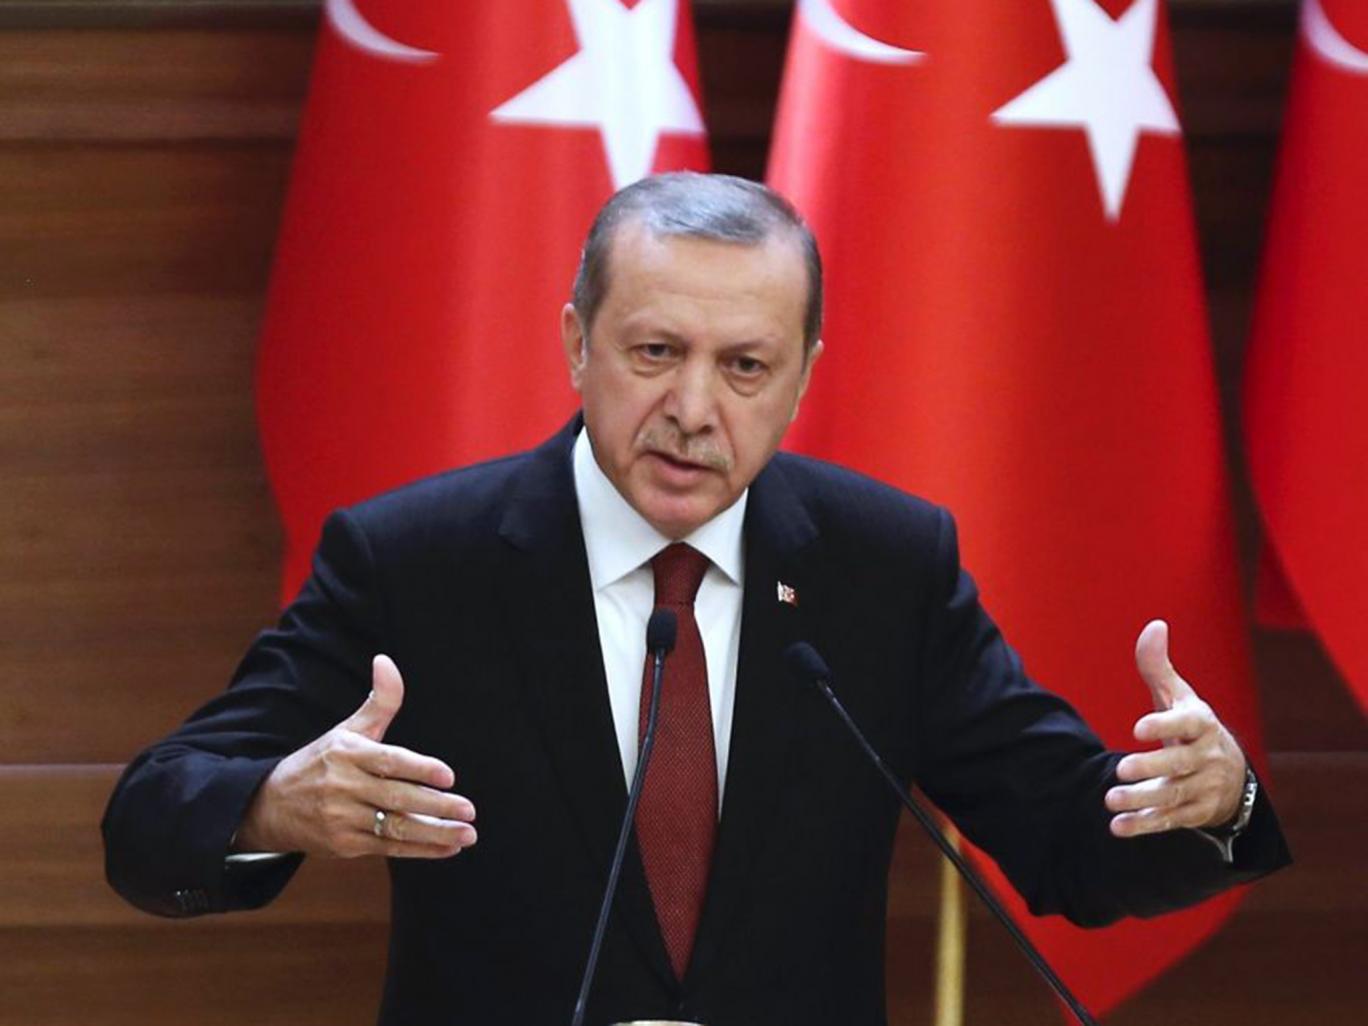 Turkish Stream: Χρηματοδότηση κατά 50% από Ρωσία και συνδεση με ΤΑΝΑΡ